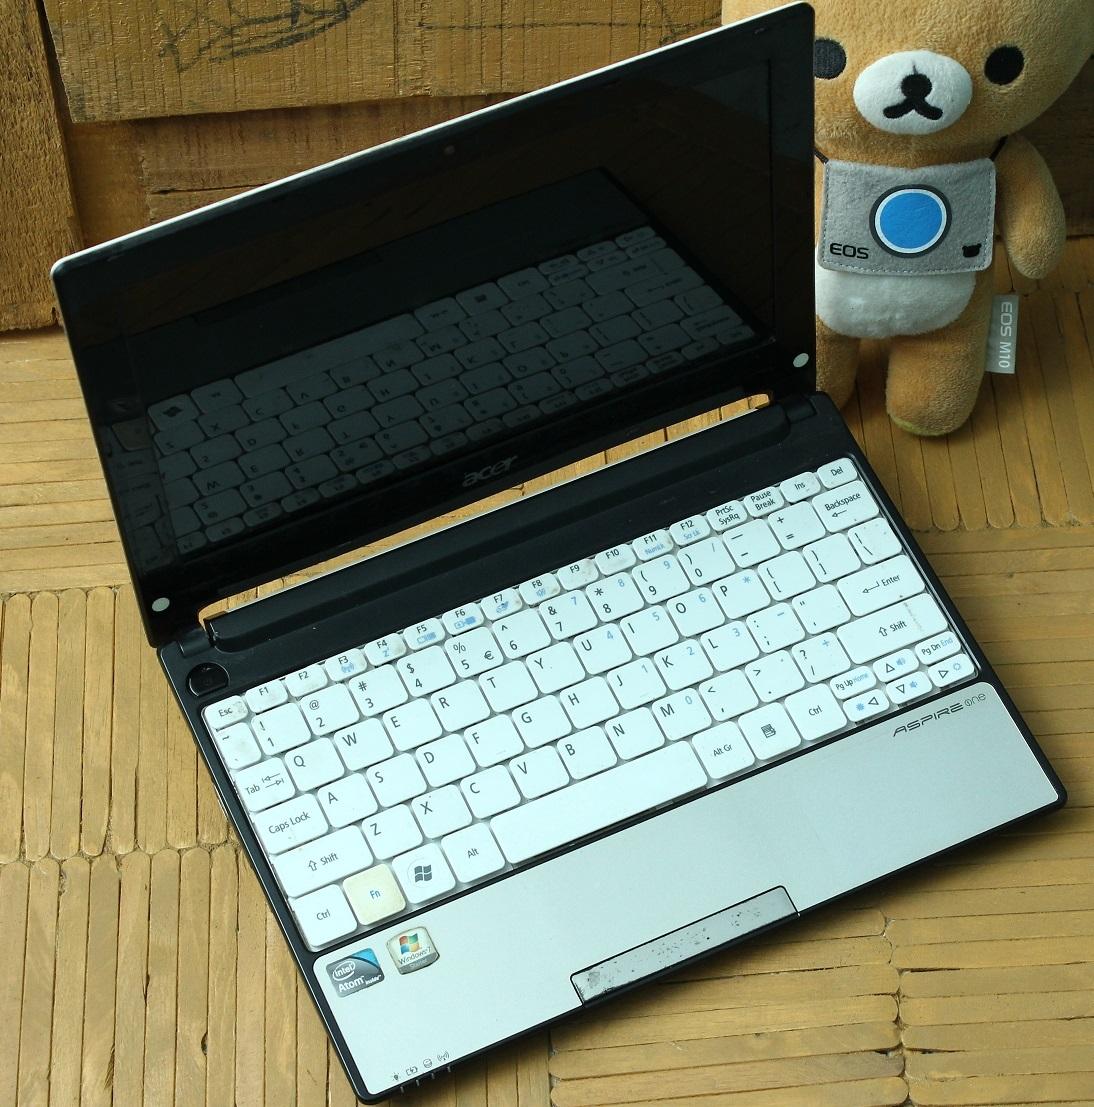 Jual Beli Laptop Second Dan Kamera Bekas Di Malang